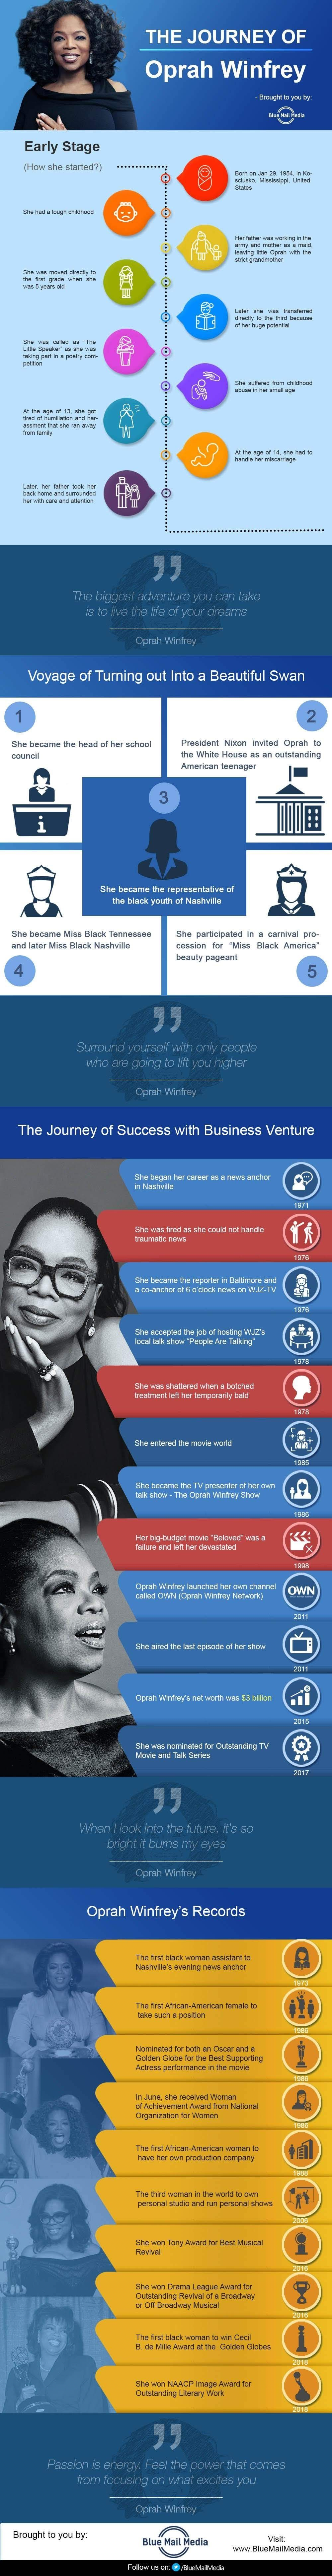 The Journey of Oprah Winfrey #infographic